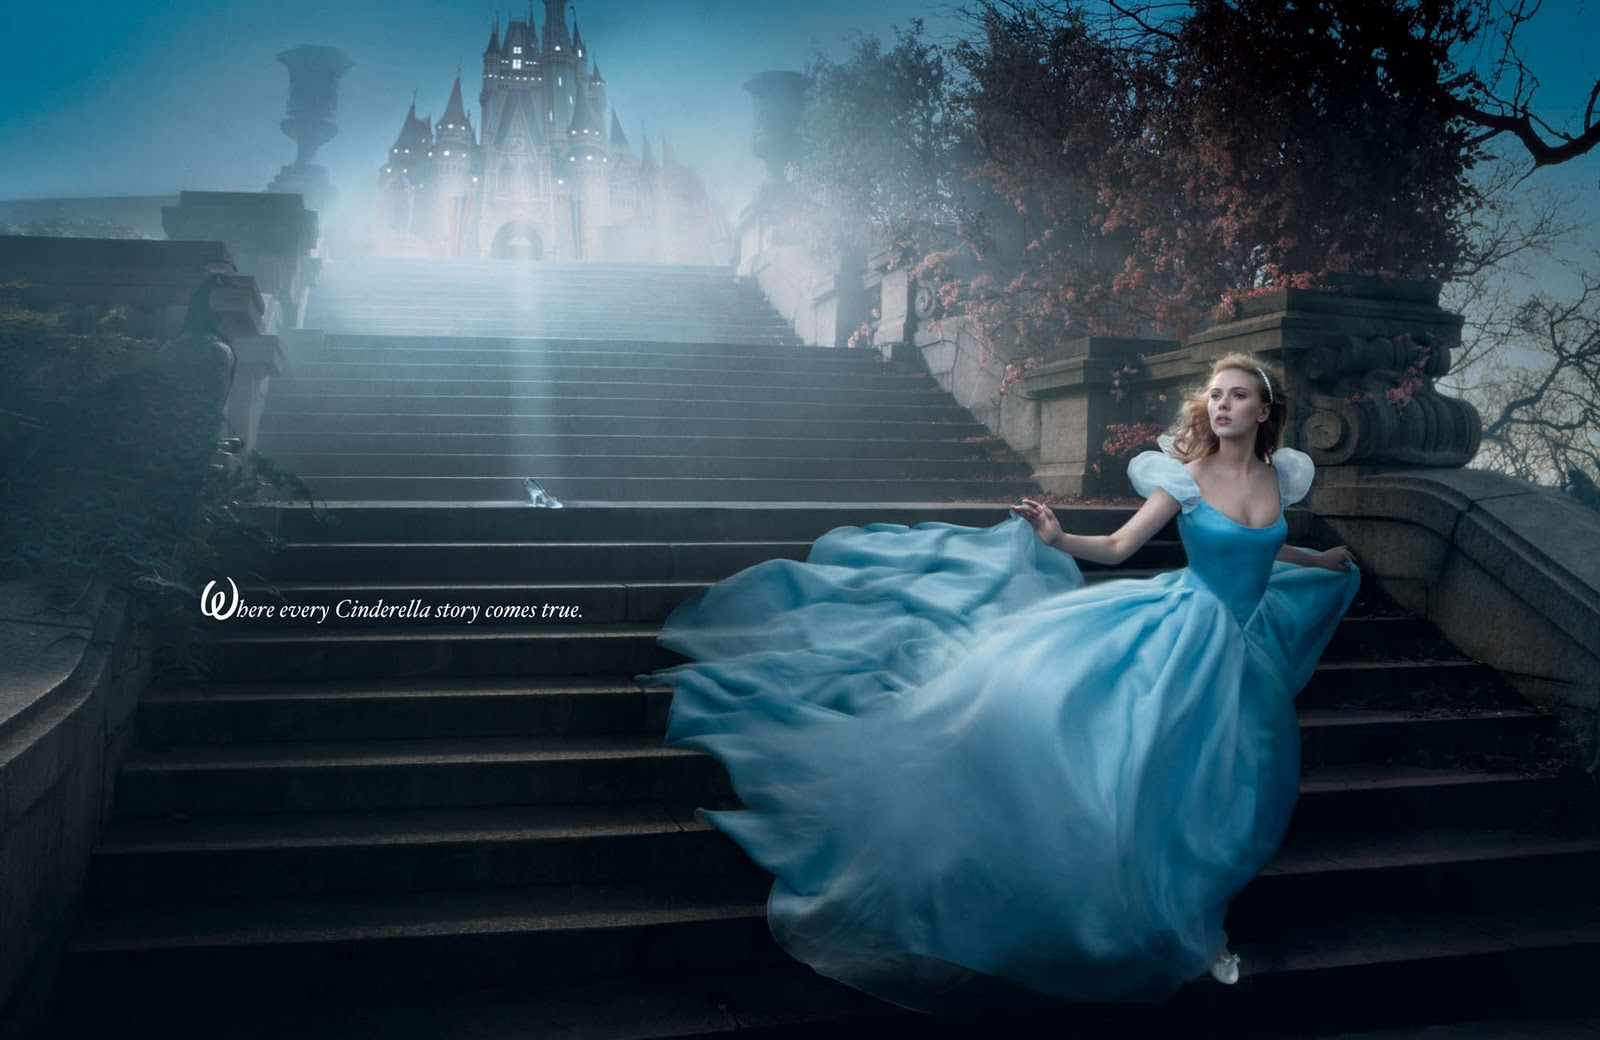 http://1.bp.blogspot.com/_vvDWoG_XX-0/TQn1uZX3HII/AAAAAAAABF8/v7aSaGK9YRg/s1600/Annie-Leibovitz-Diseny-dream-portrait-disney-8932459-2000-1300.jpg